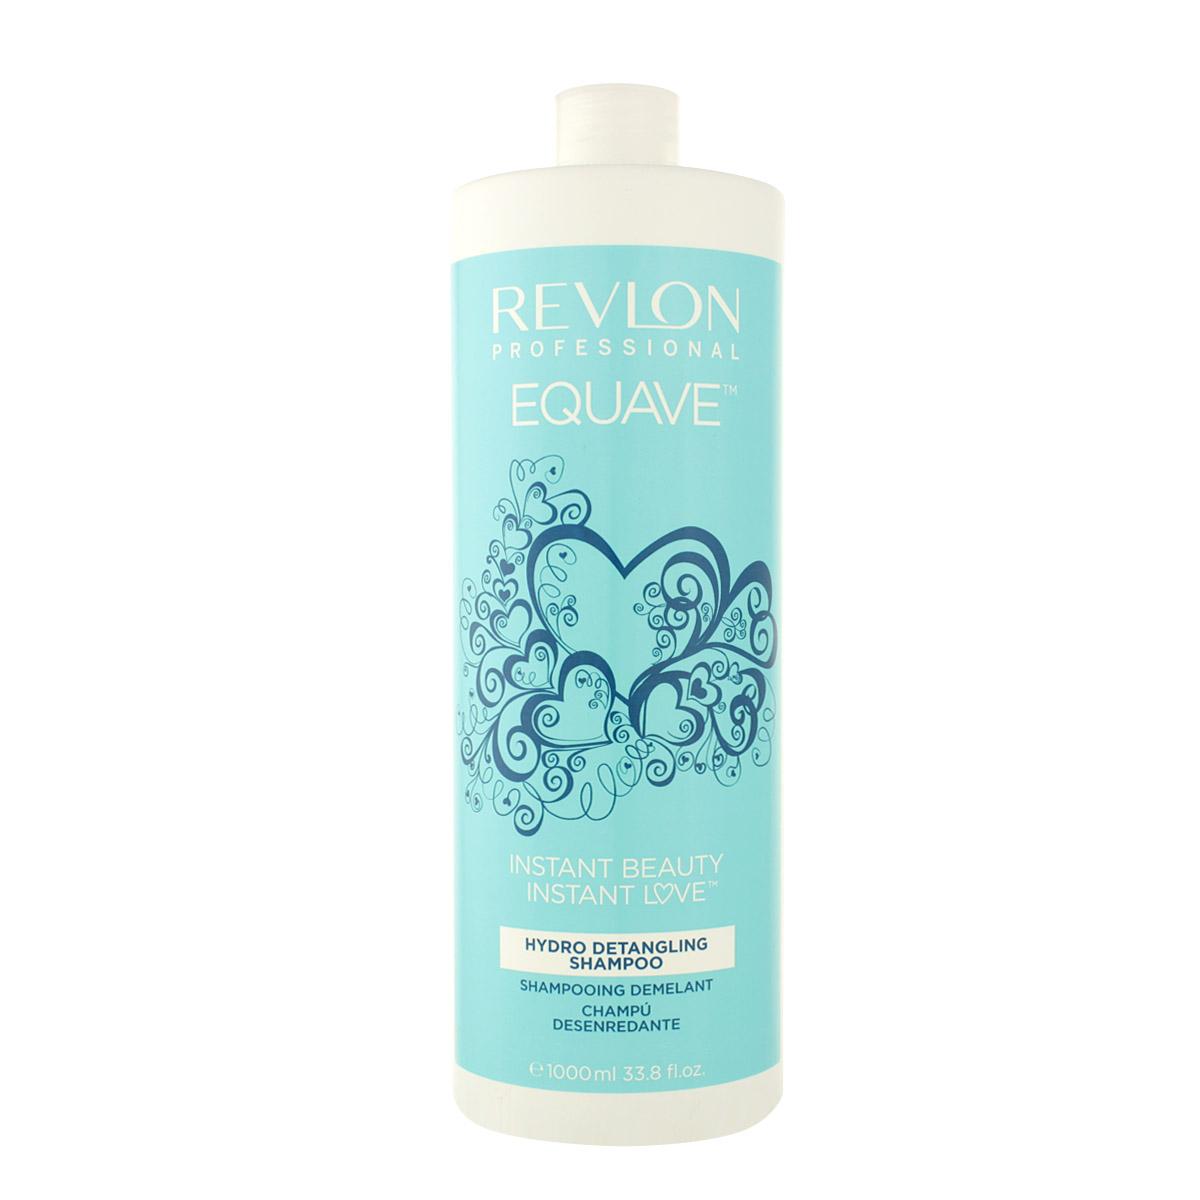 Revlon Professional Equave Instant Beauty Hydro Detangling Shampoo 1000 ml